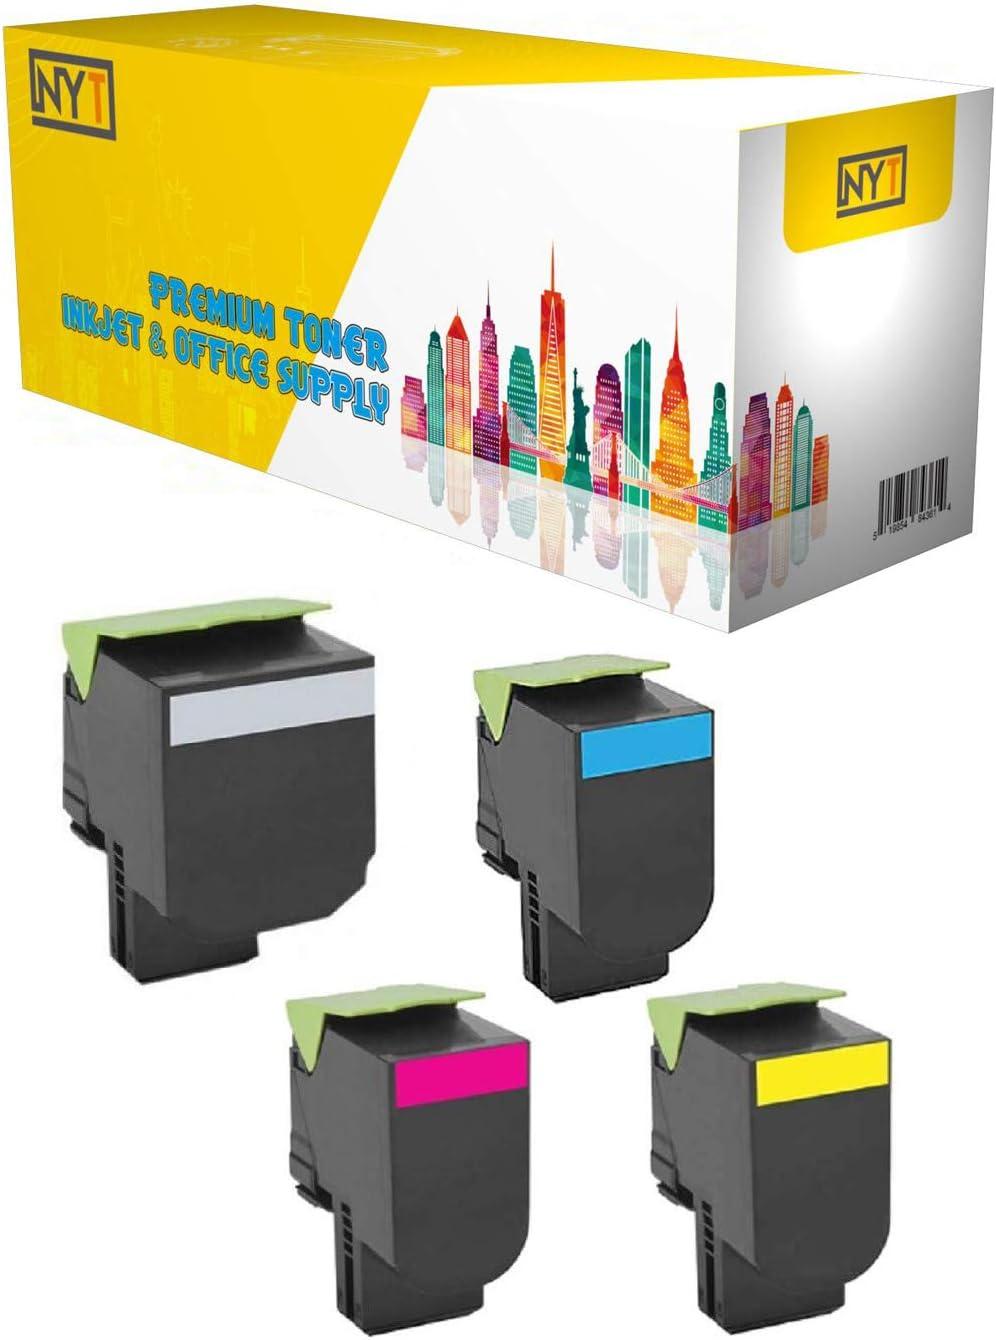 NYT Remanufactured High Yield Toner Cartridge Replacement for 71B0H10 H20 H30 H40 71B1HK0 71B1HC0 71B1HM0 71B1HY0 for Lexmark CS417dn CX417de CS517de Made in USA. Black,Cyan,Magenta,Yellow,4-Pack